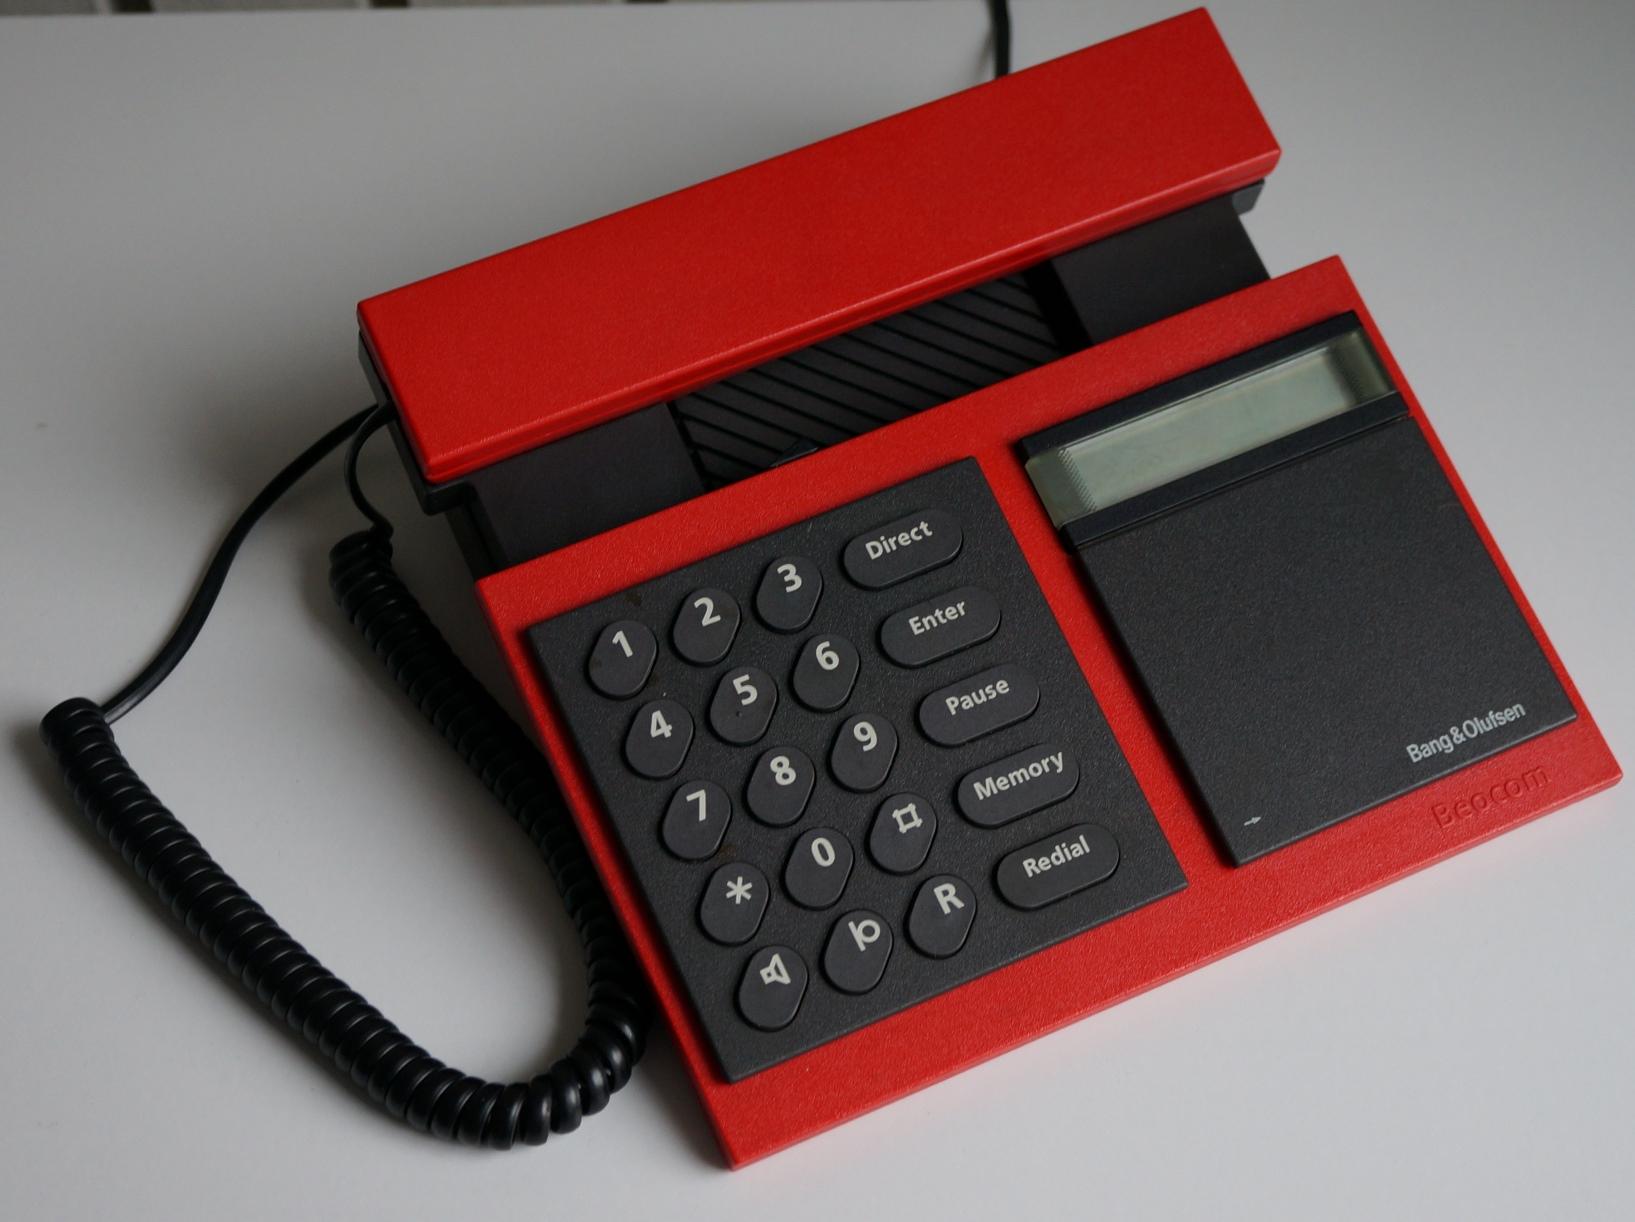 BeoCom 2000 rot Image